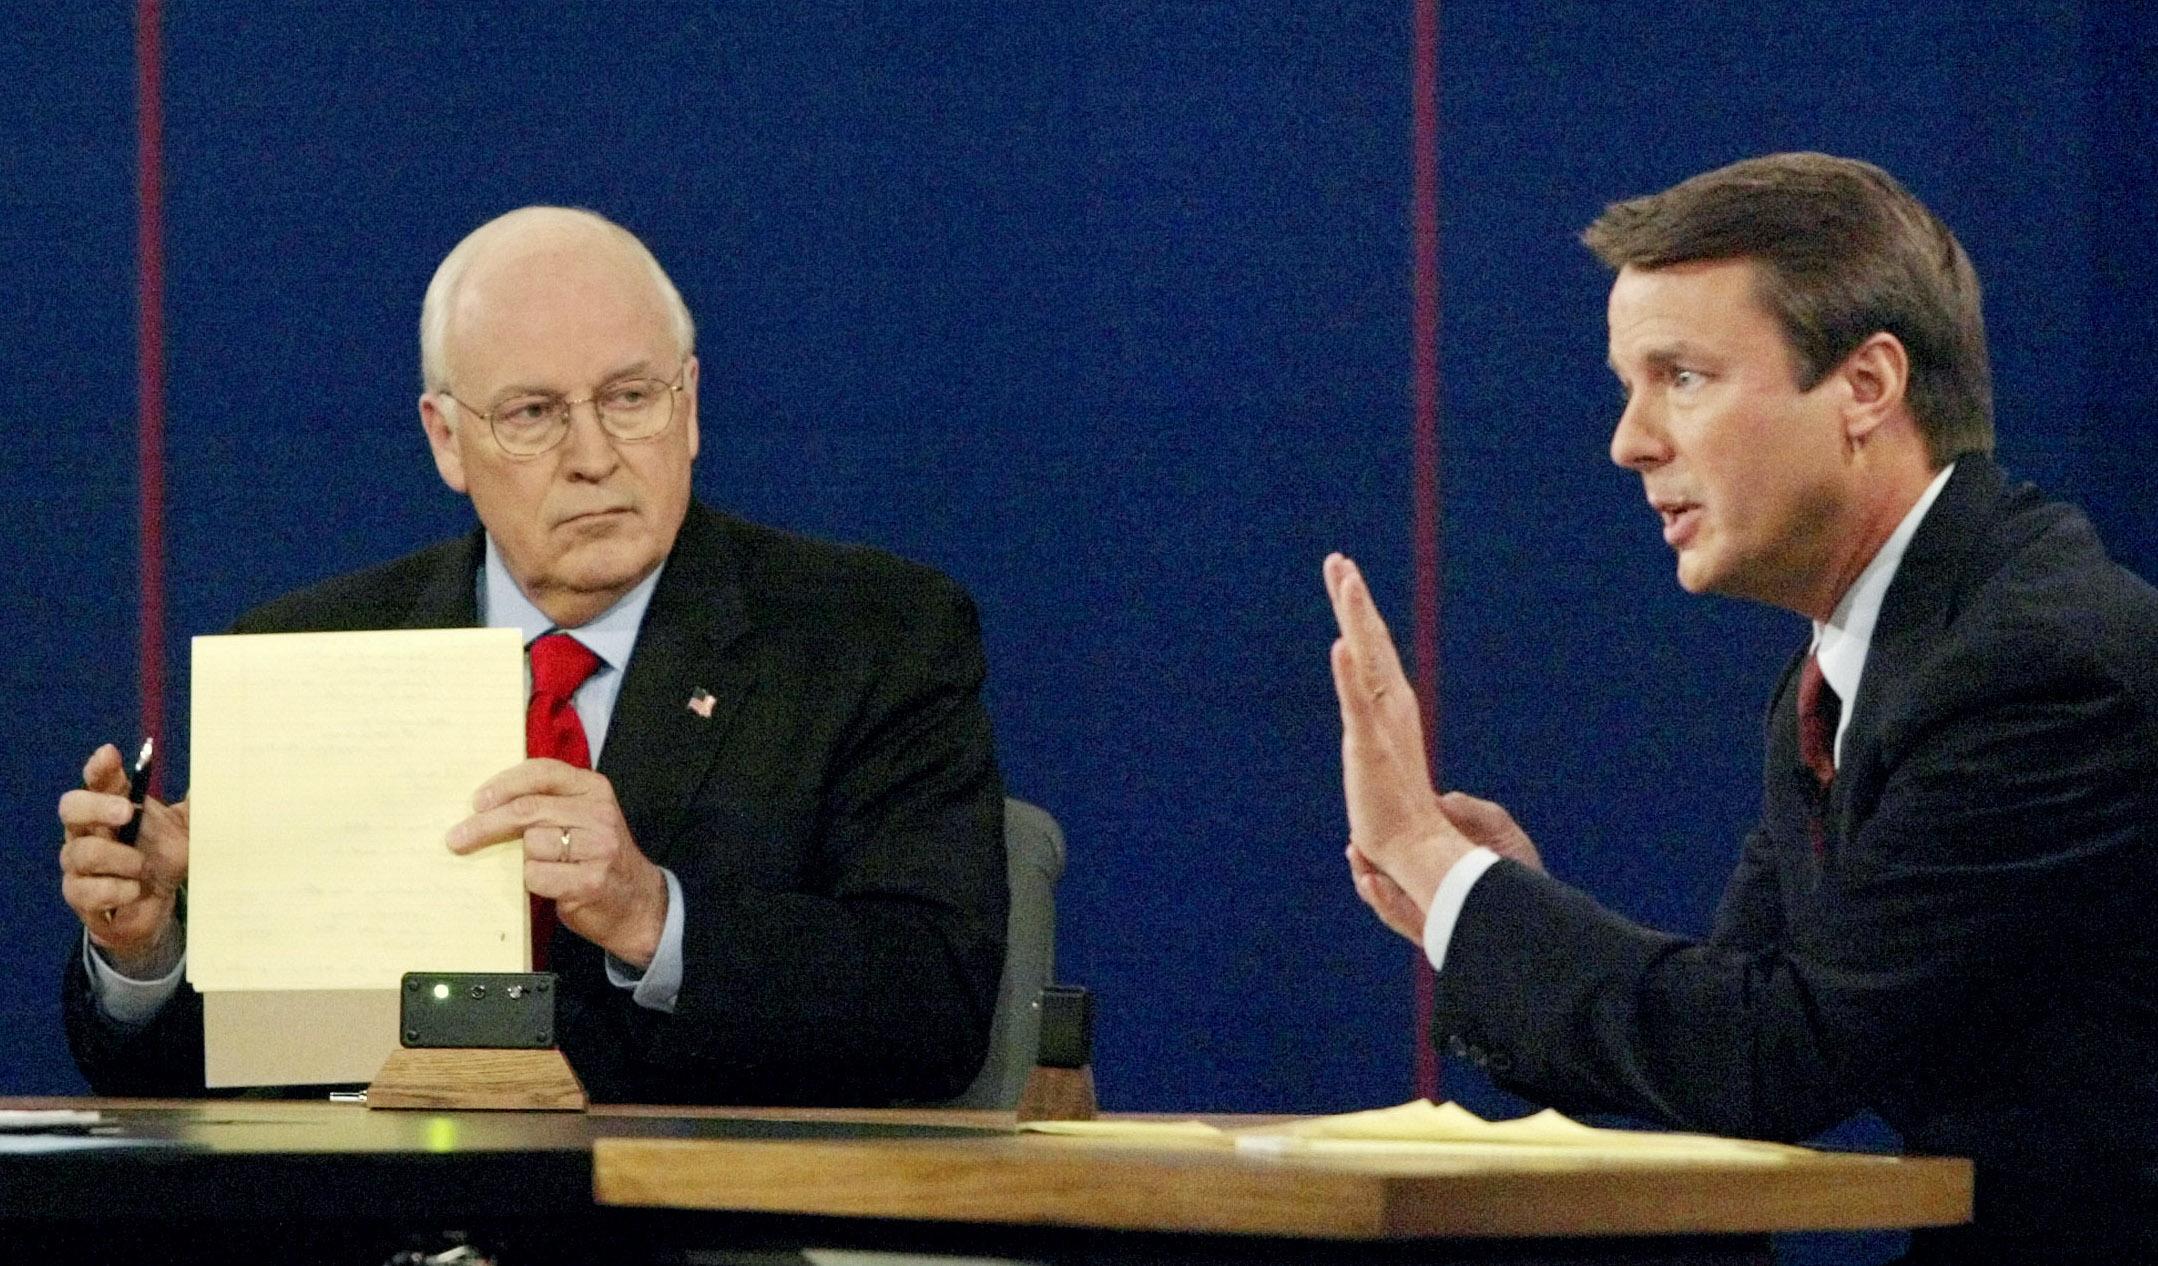 Cheney vs. Edwards: The 2004 vice presidential debate